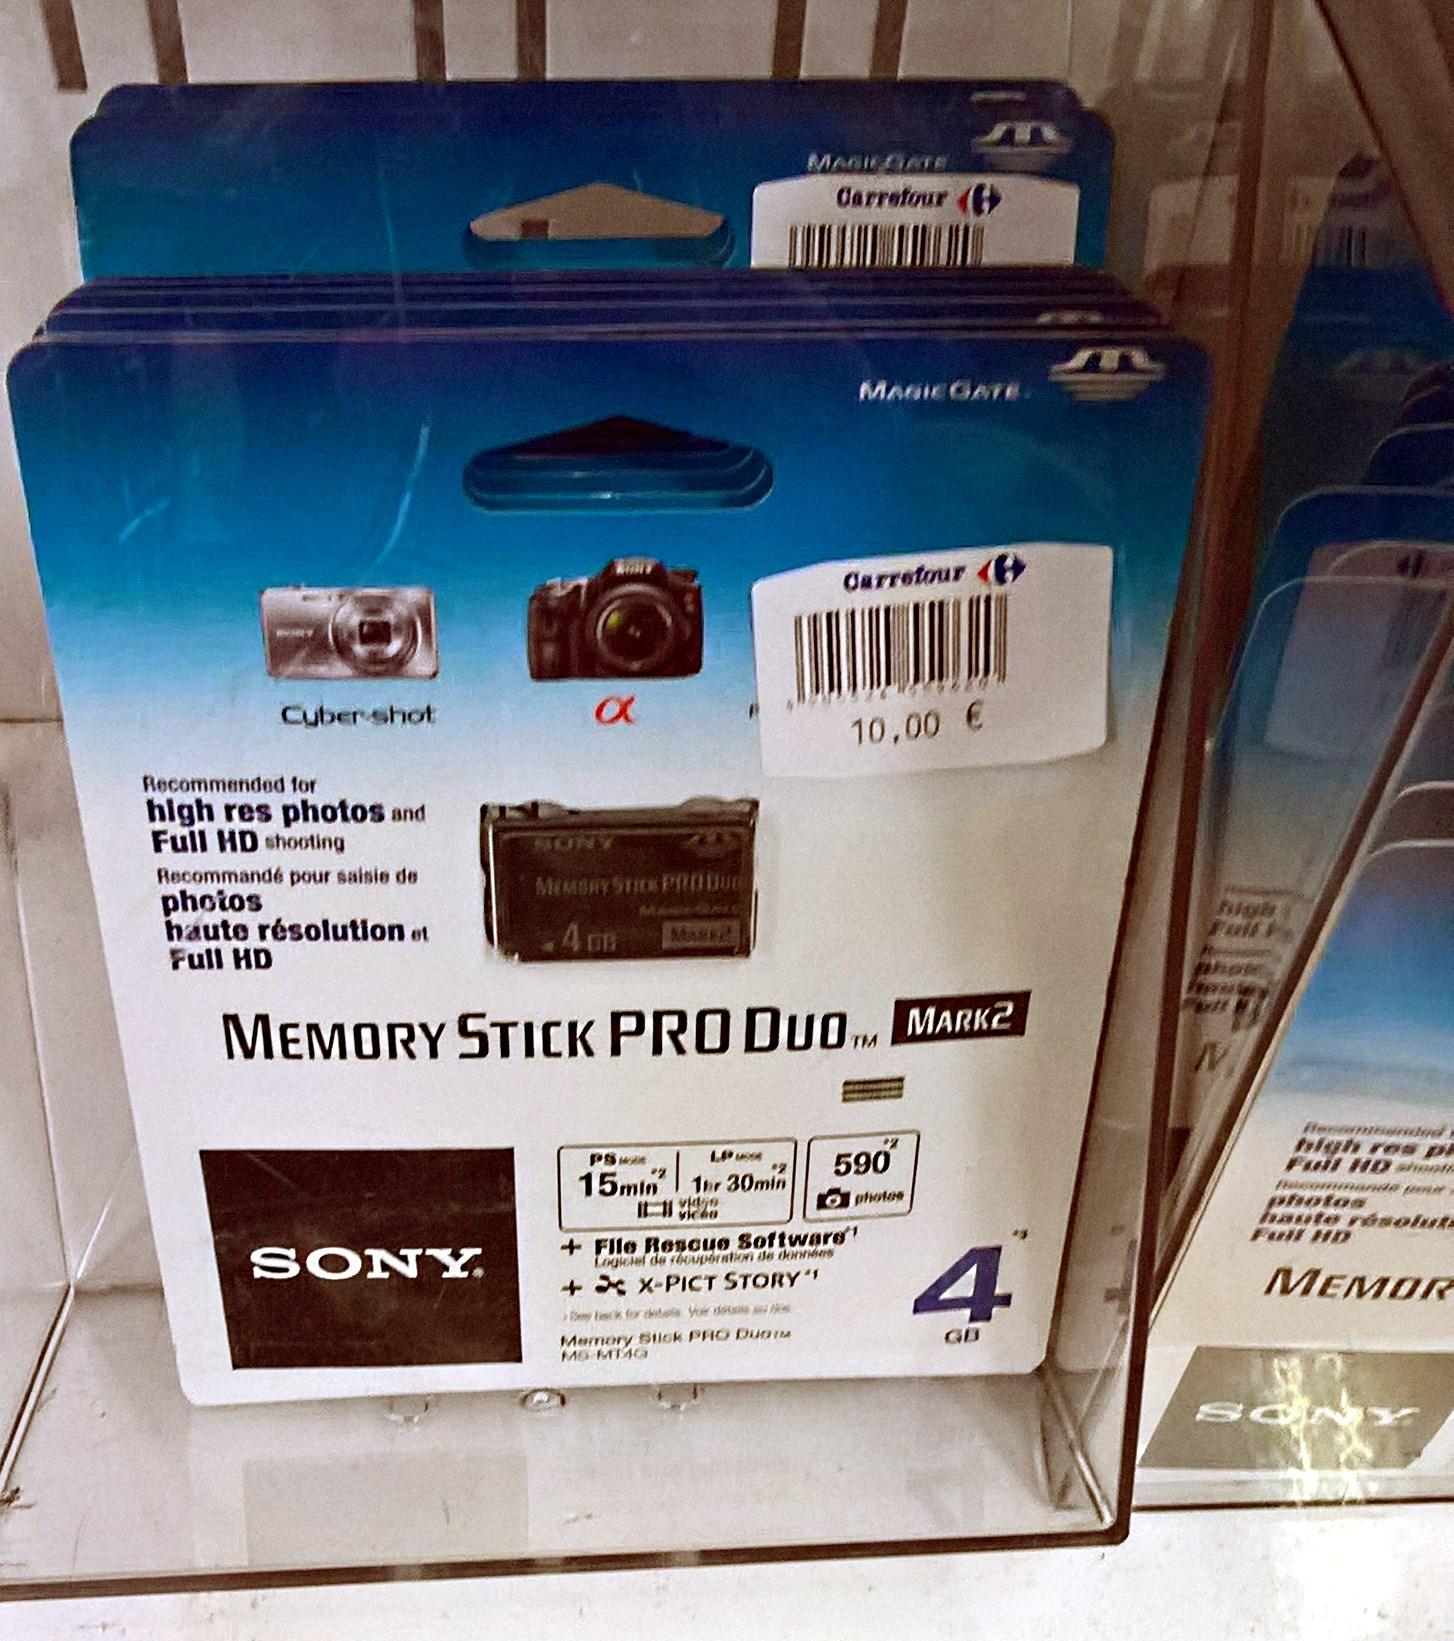 Memory Stick Pro Duo 4Gb (Outlet Carrefour de Terrassa)